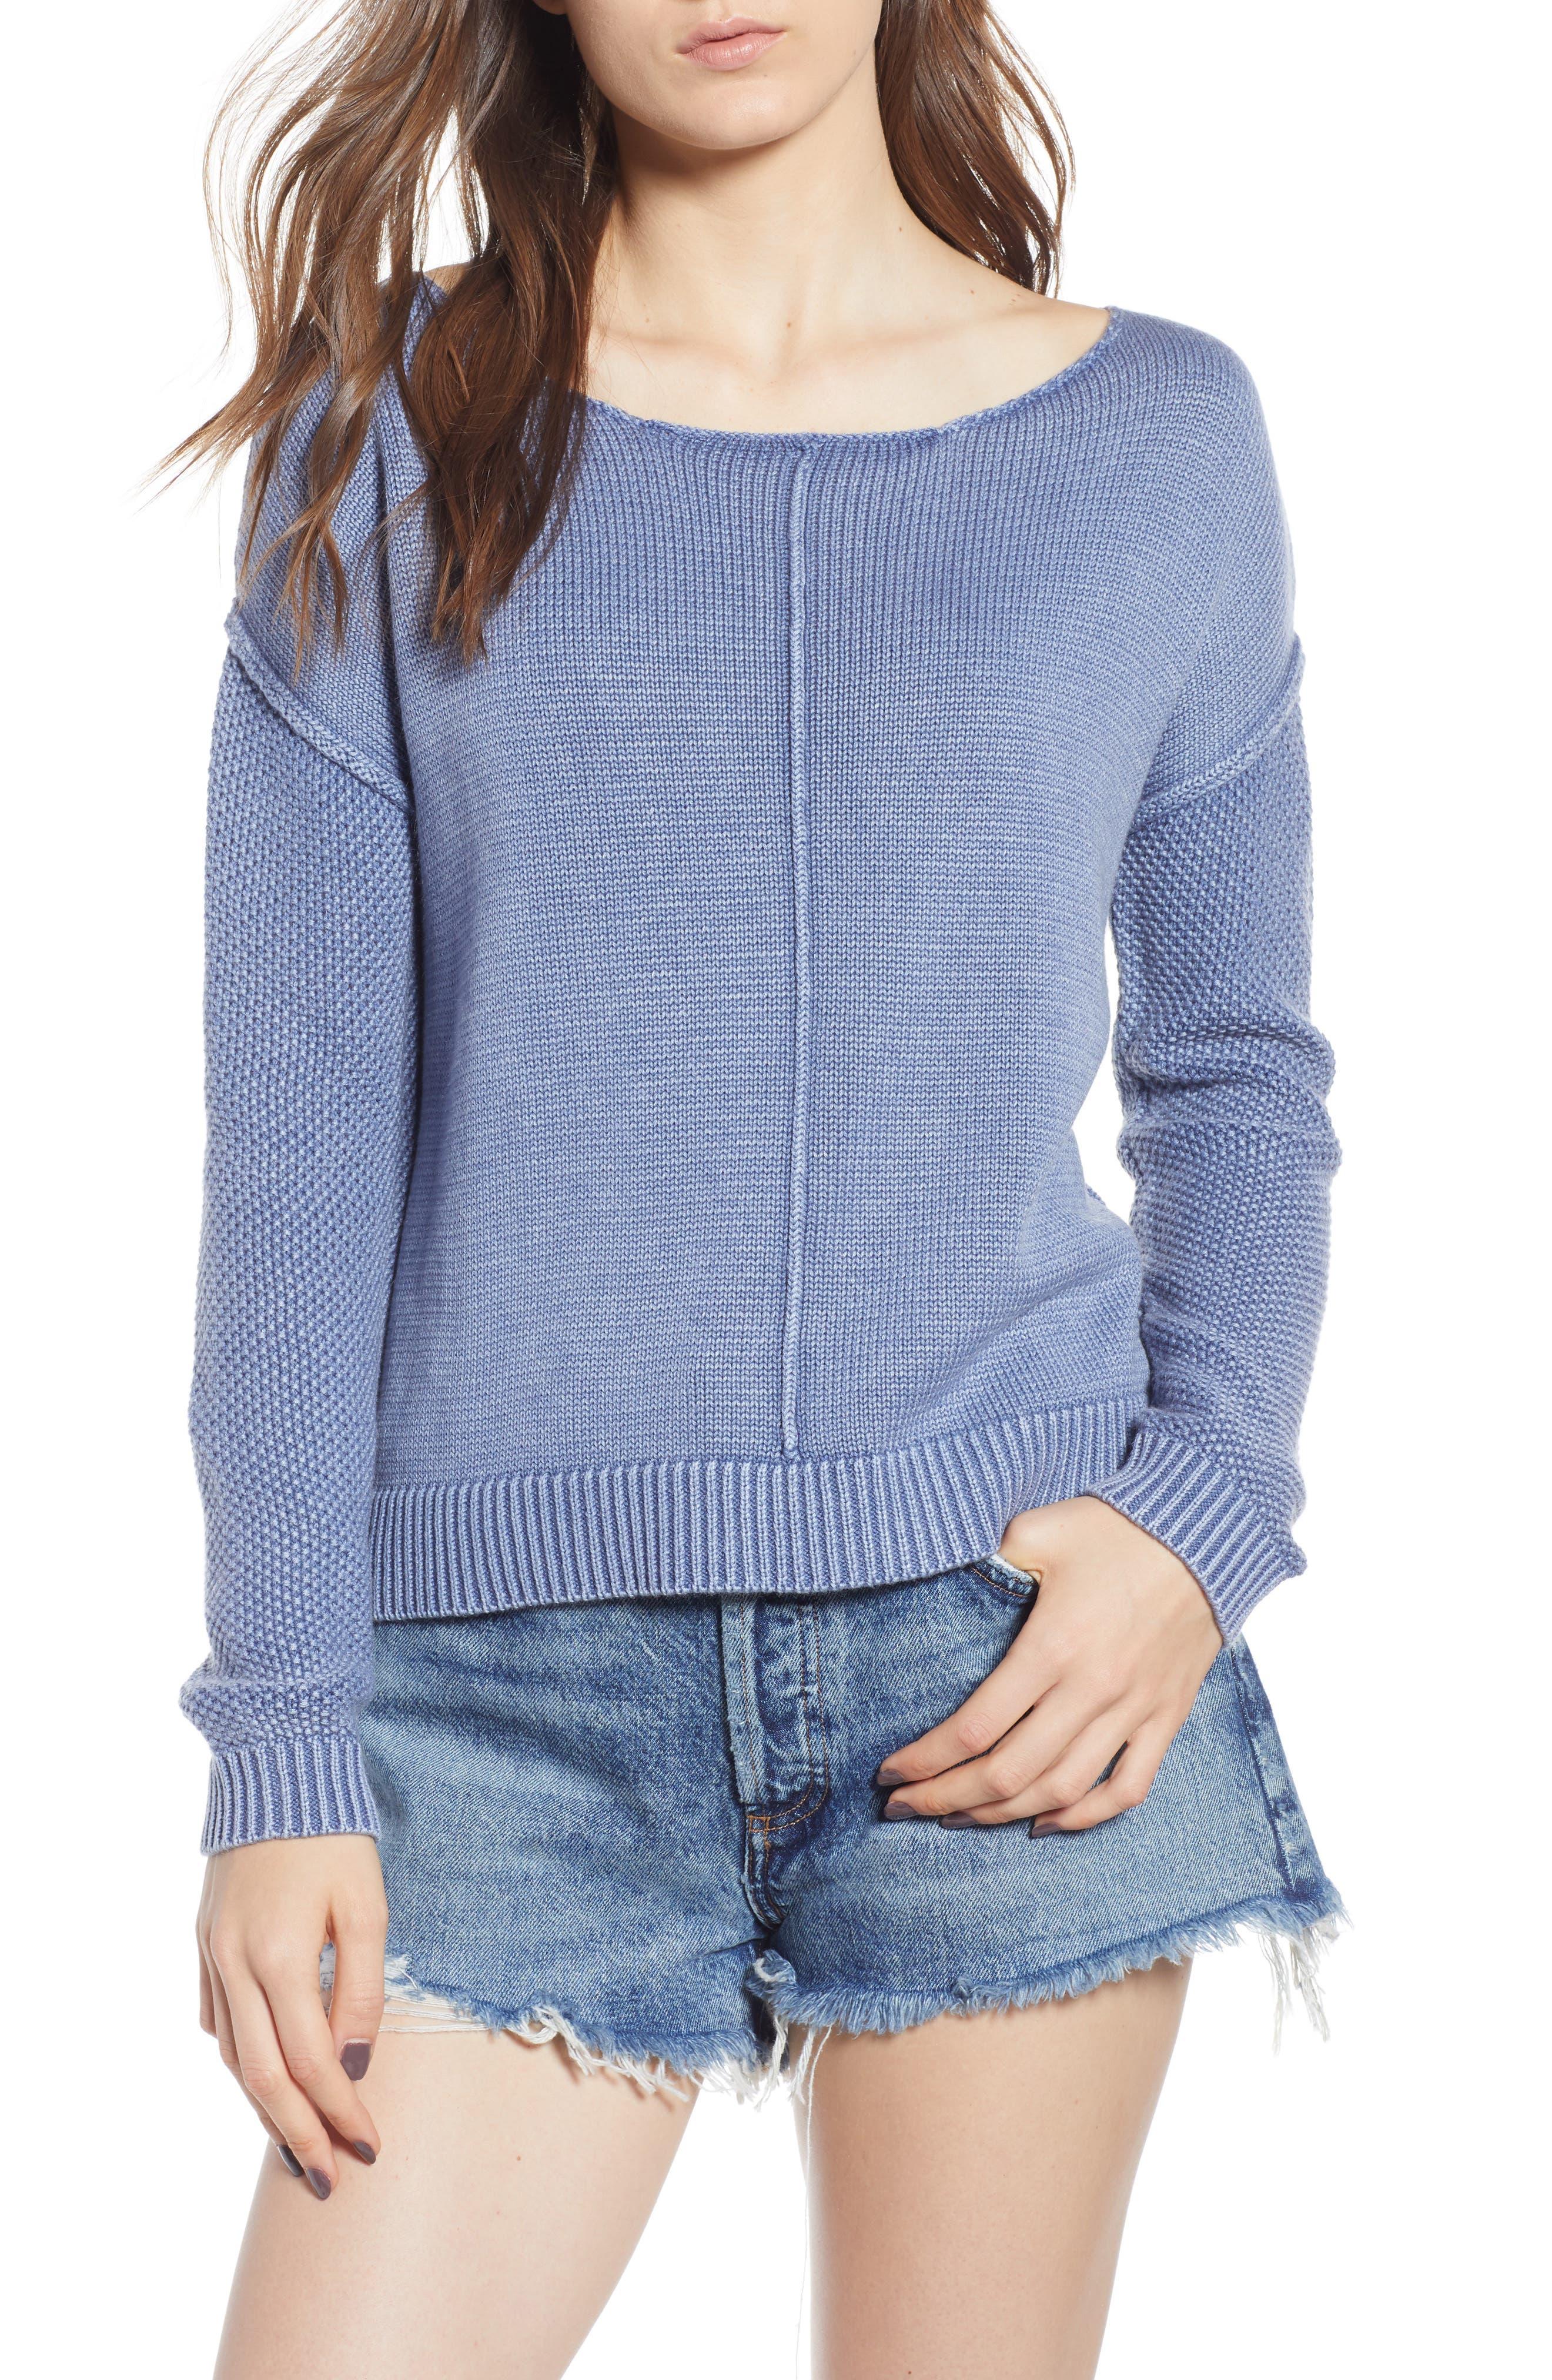 Erin Knit Sweater,                         Main,                         color, Sand Washed Indigo